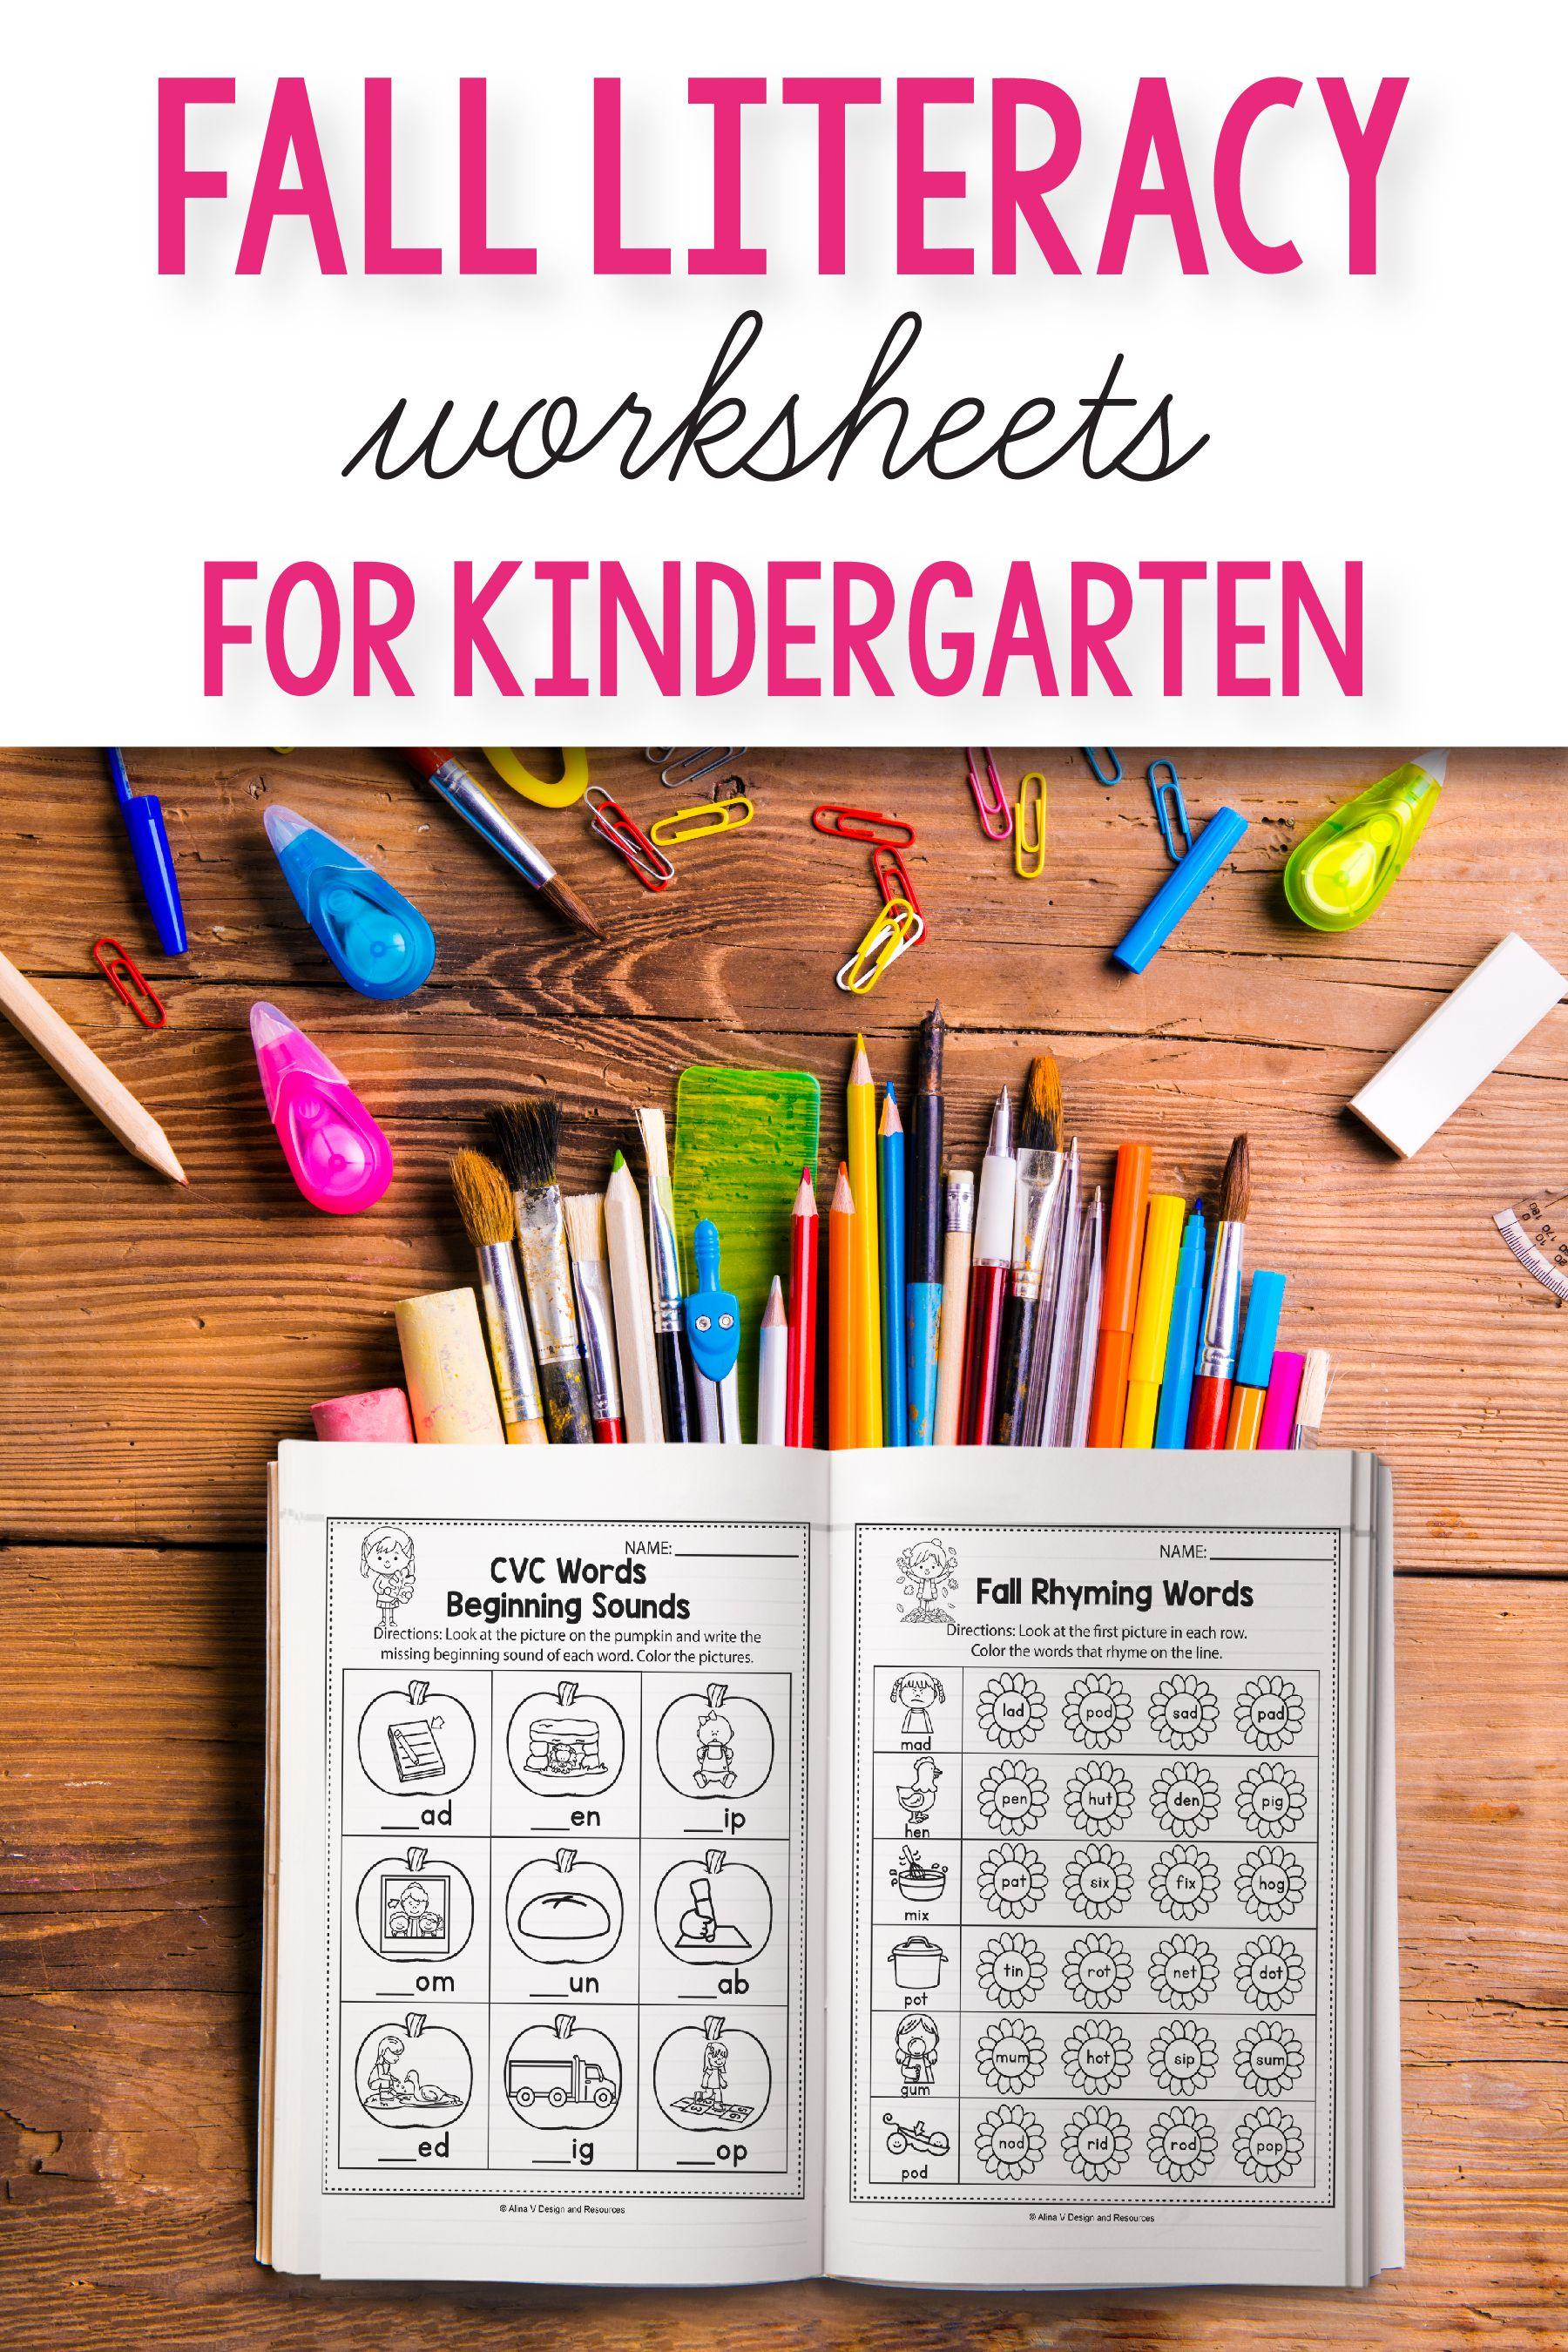 Fall Literacy Activities For Kindergarten 1st Grade And